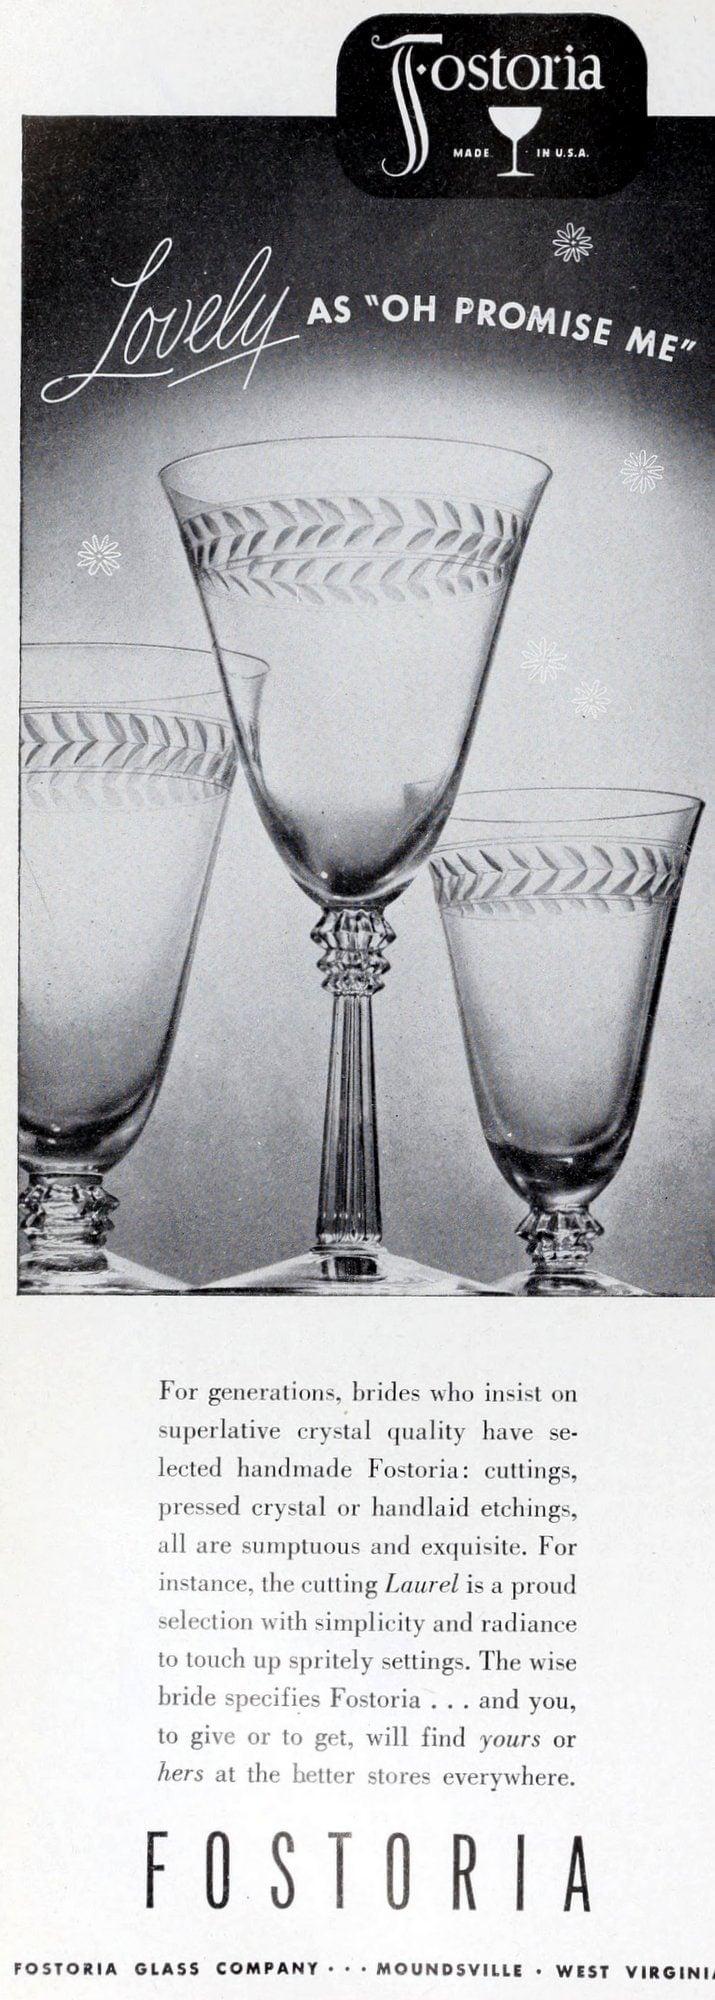 Old Fostoria stemware from 1948 (2)